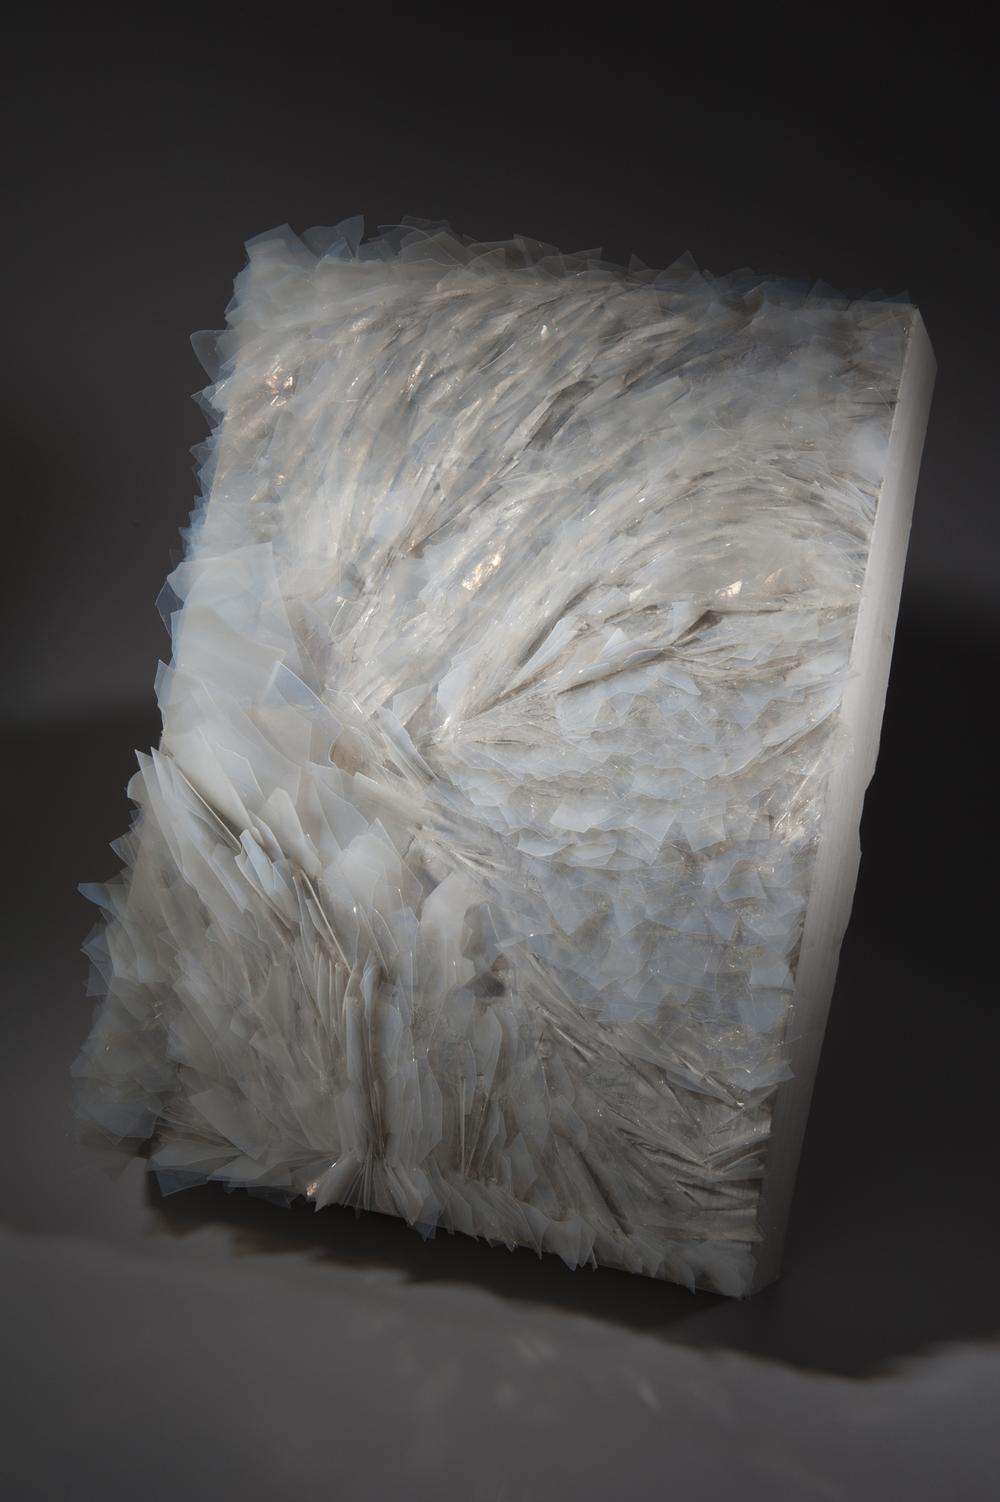 soft glass